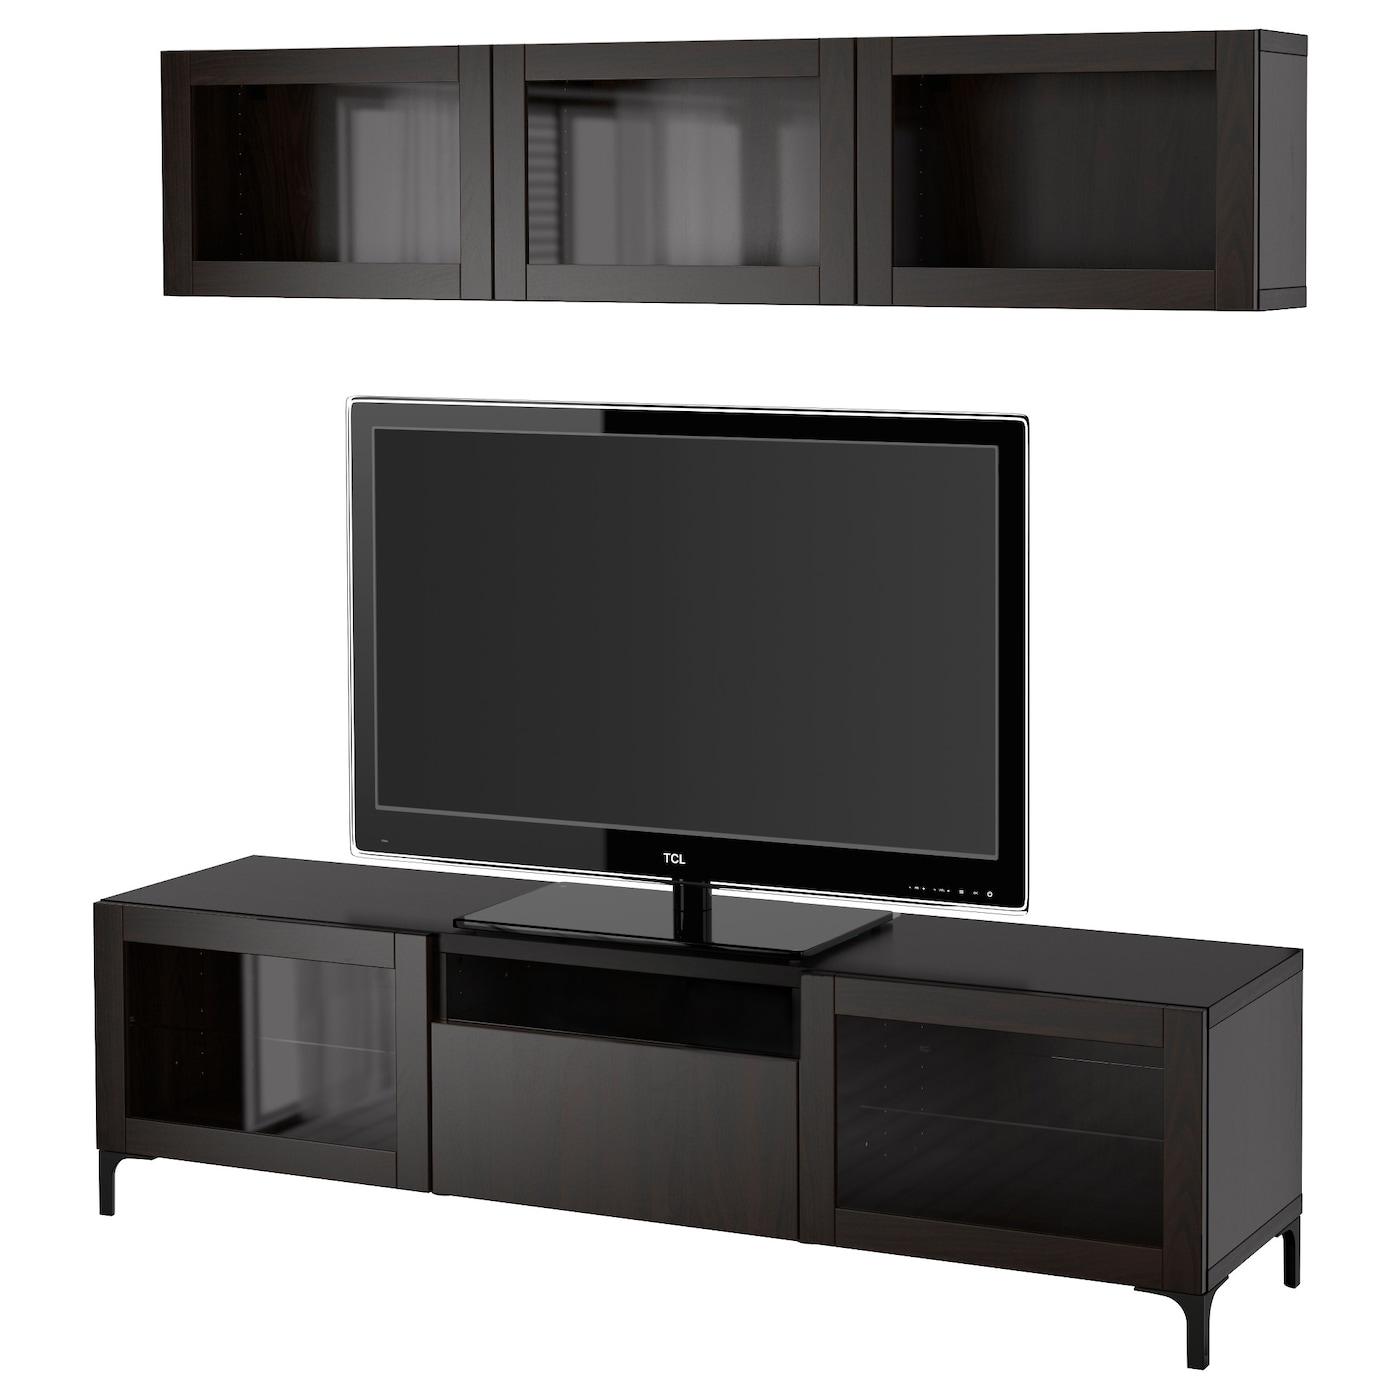 best tv storage combination glass doors lappviken sindvik. Black Bedroom Furniture Sets. Home Design Ideas